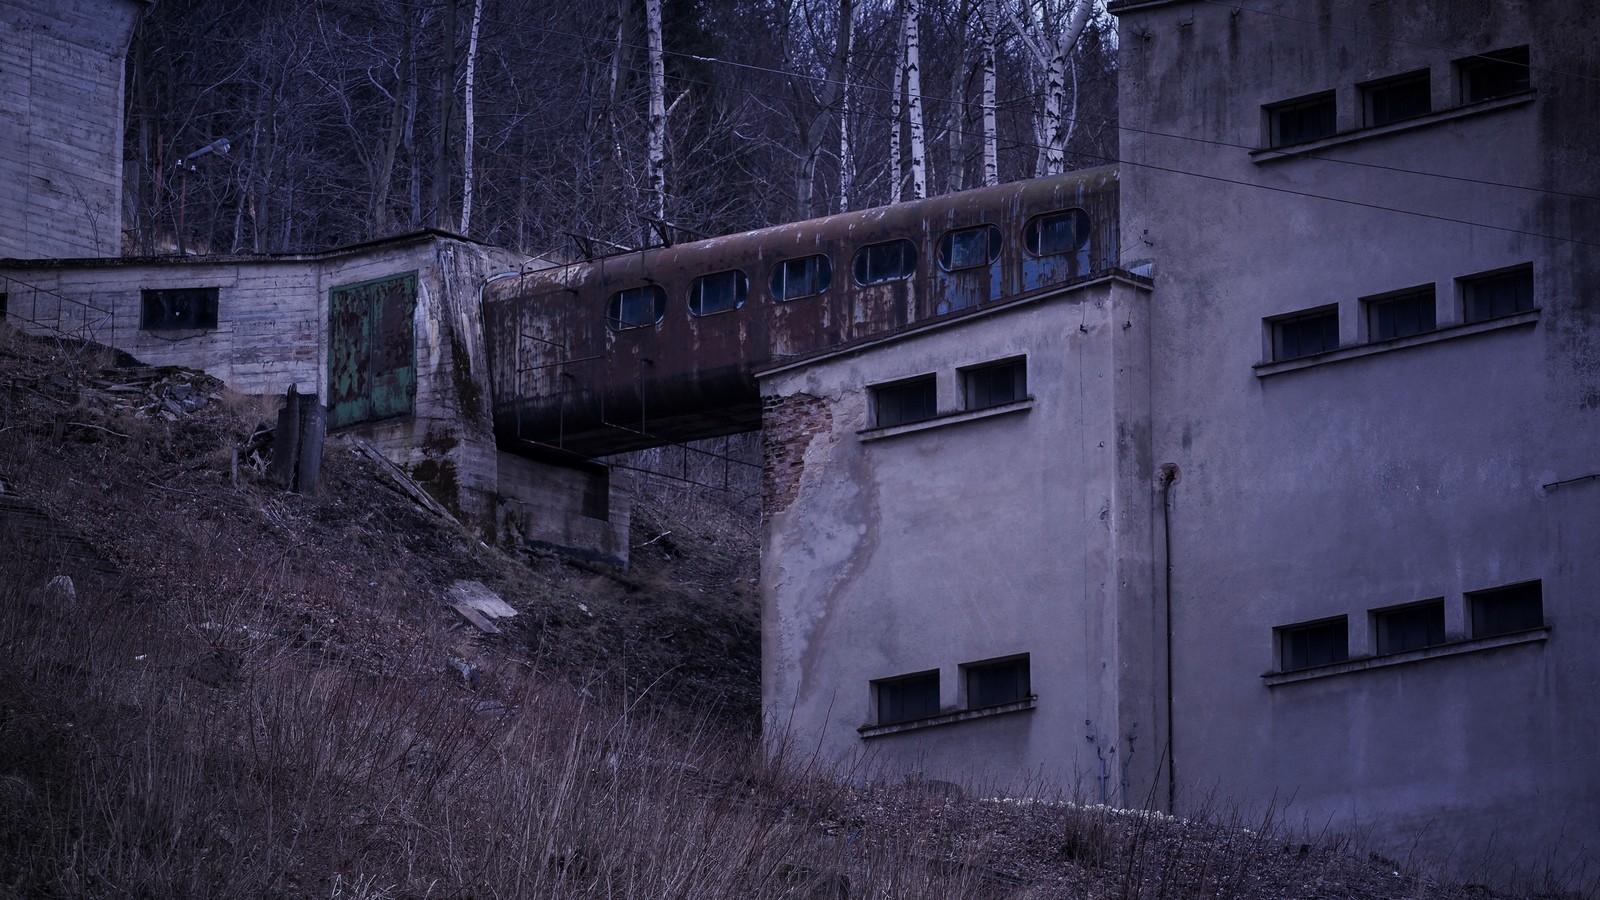 R-1 Kowary - taśmociąg